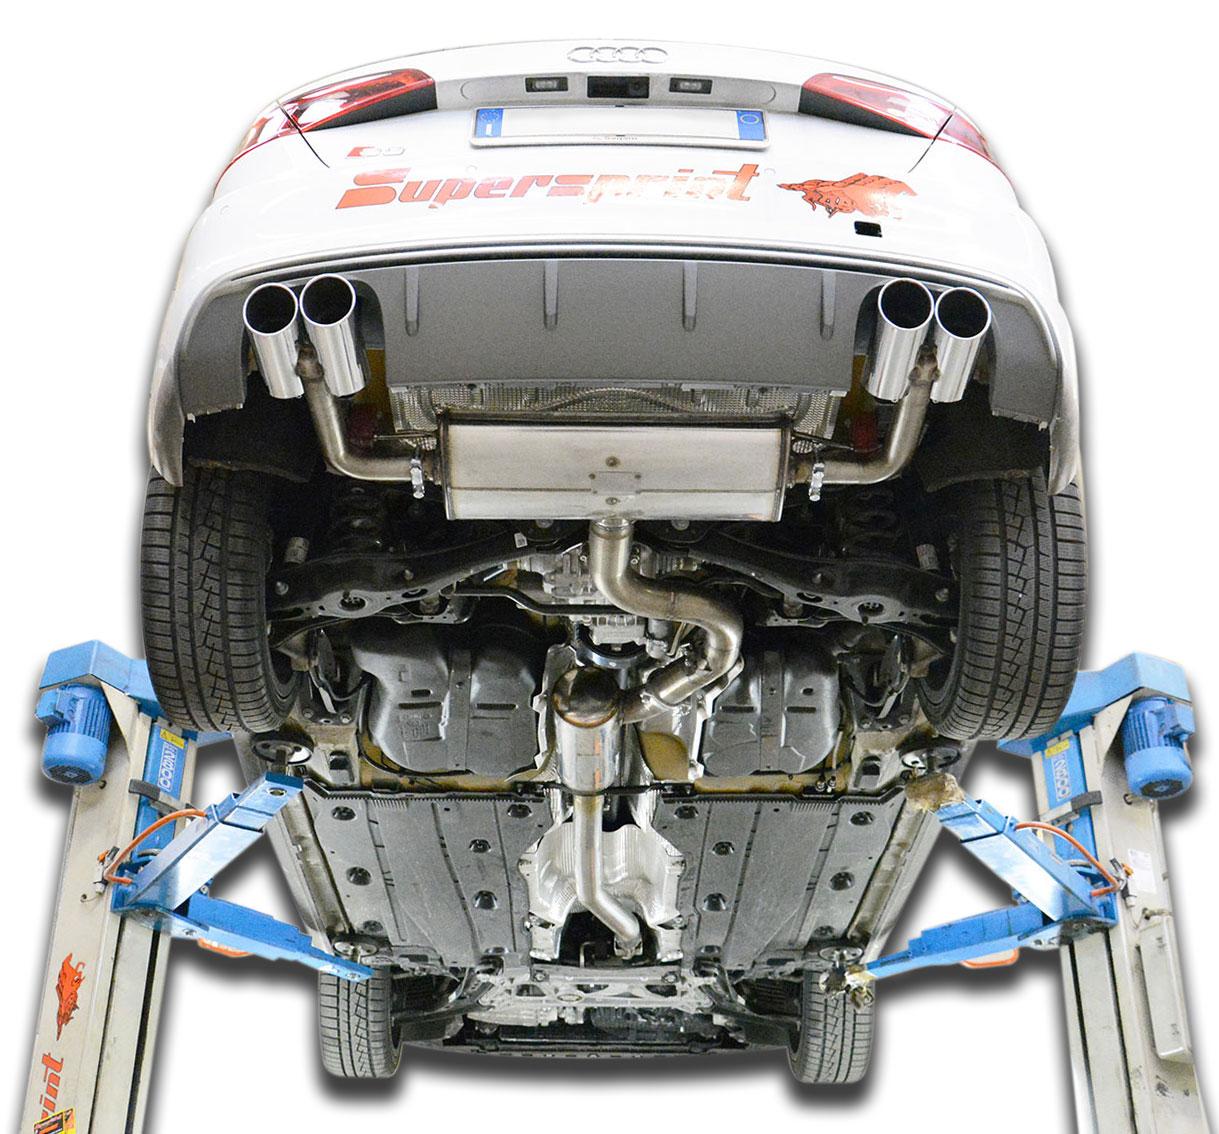 Audi S3 8v 8va 2013 Gt Supersprint Auspuffanlage In K 252 Rze Verf 252 Gbar 2014 Januar 23